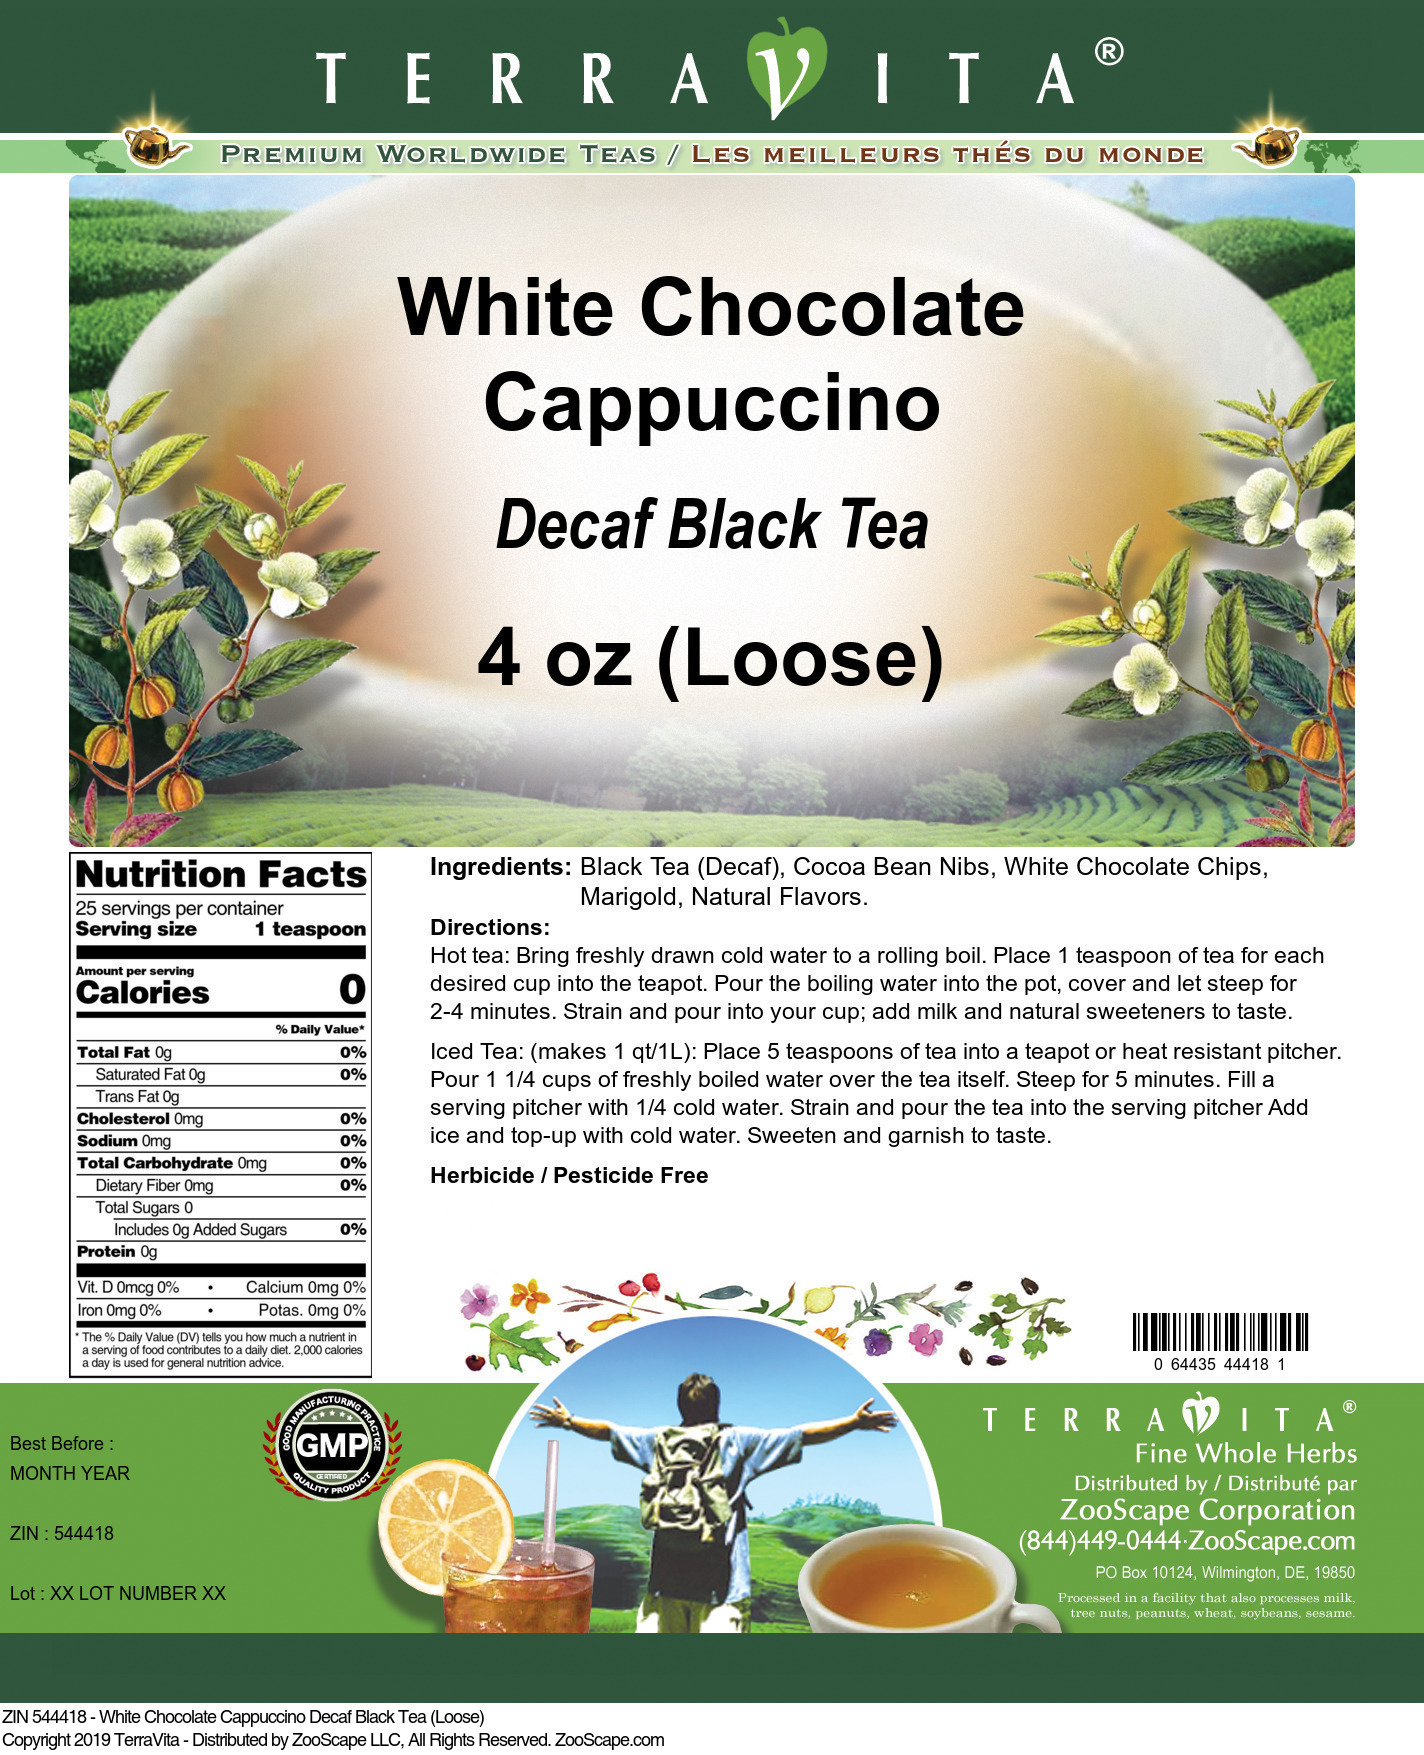 White Chocolate Cappuccino Decaf Black Tea (Loose)